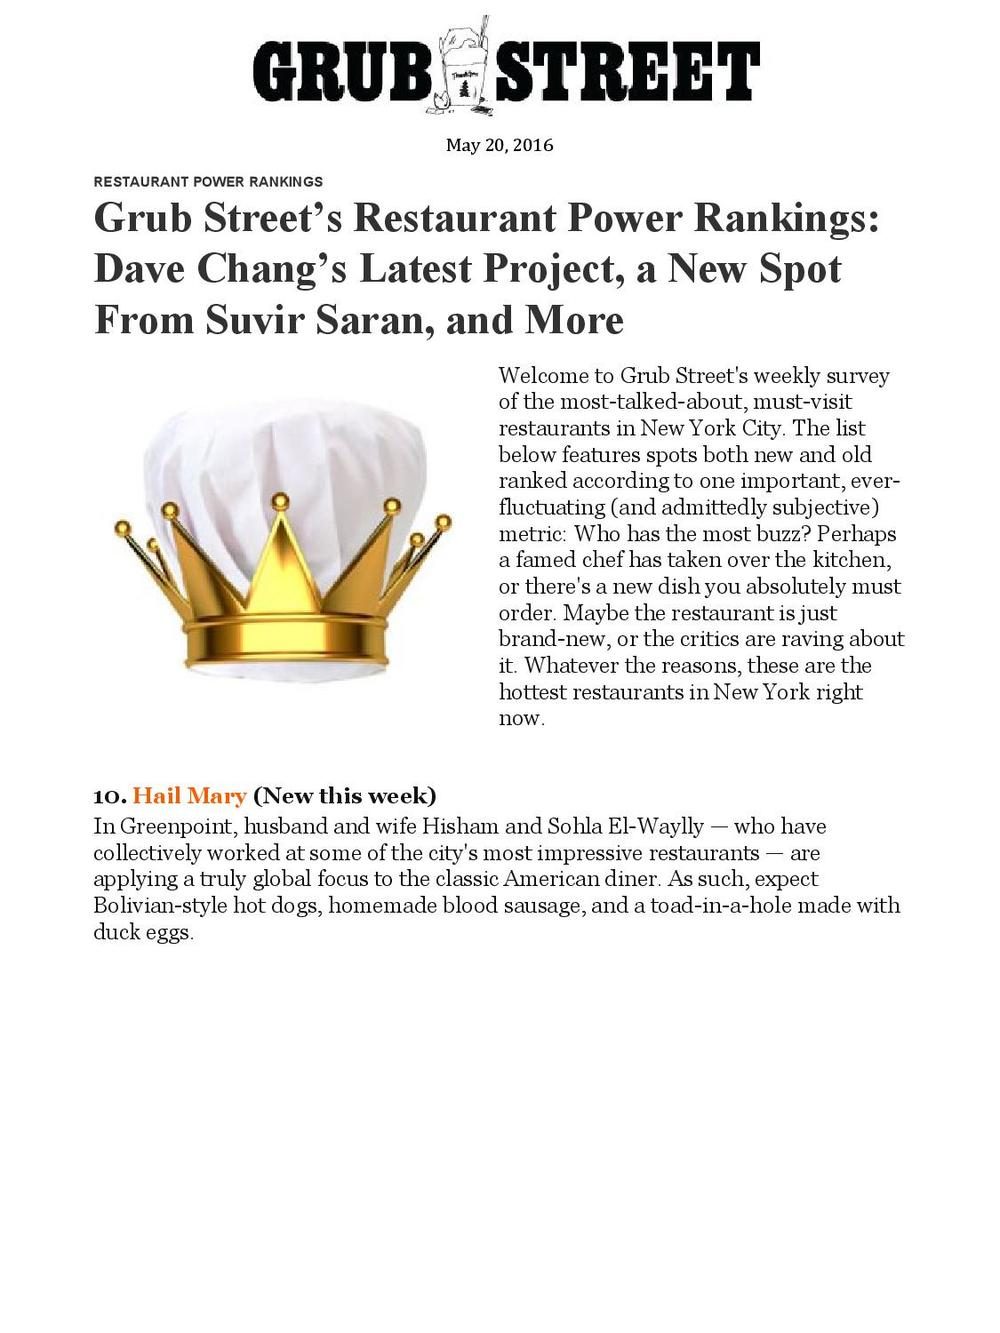 GrubStreet_HailMary_5.20.16-page-001.jpg